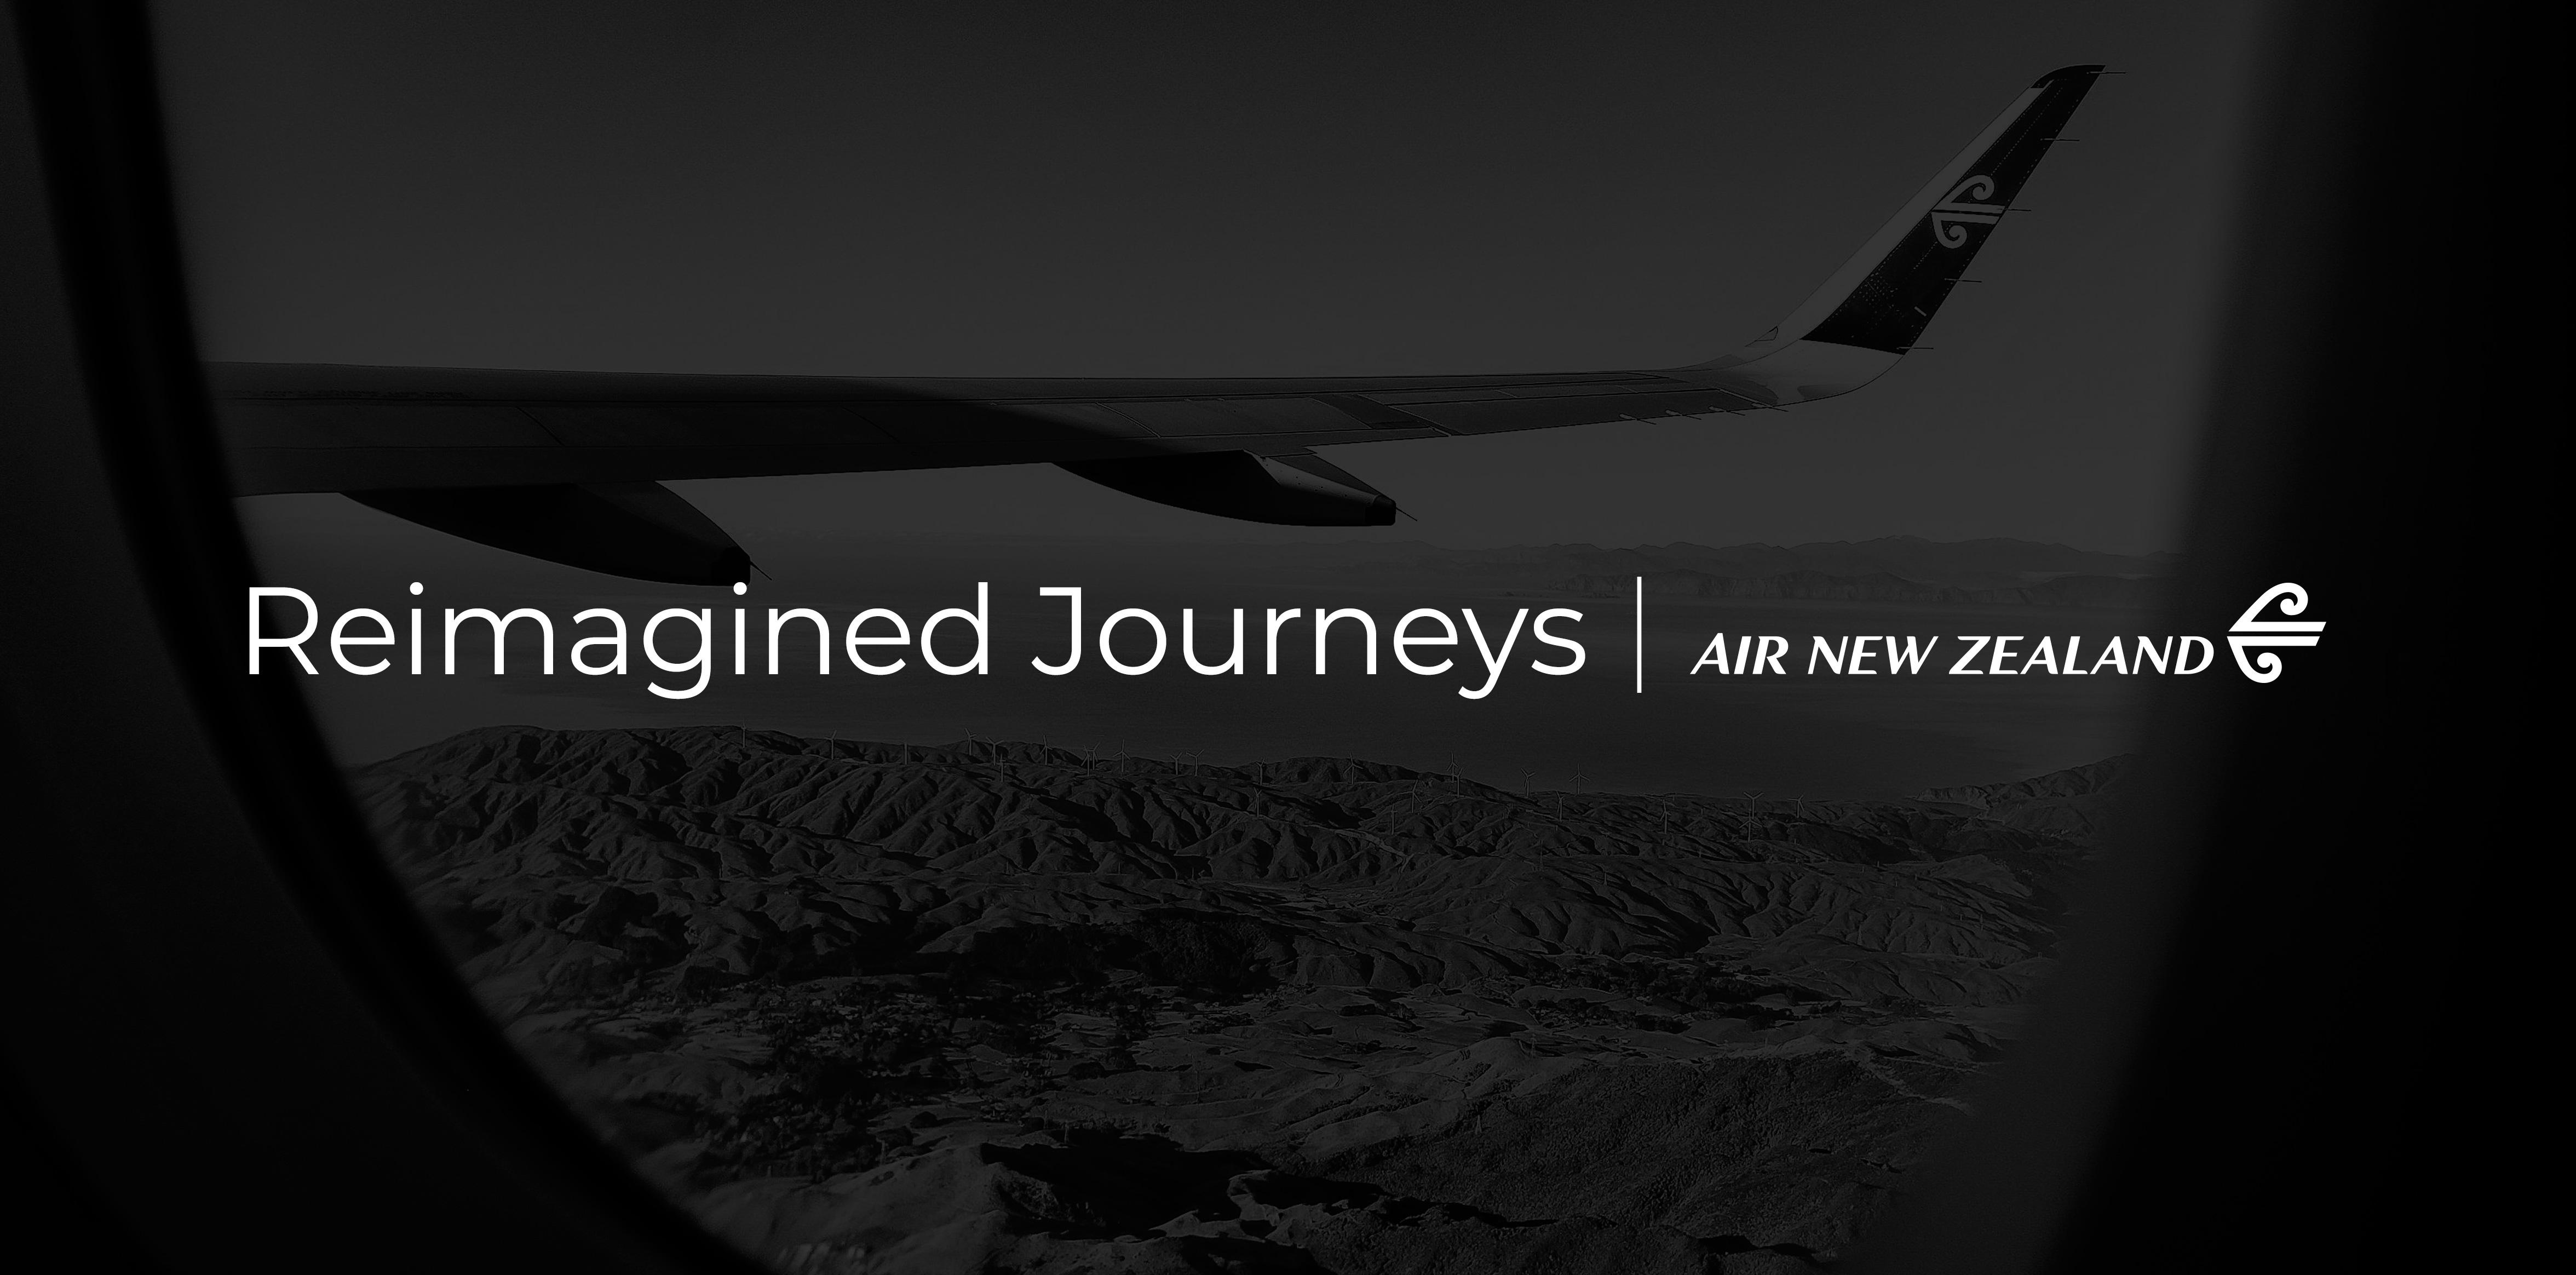 Reimagined Journeys Air New Zealand